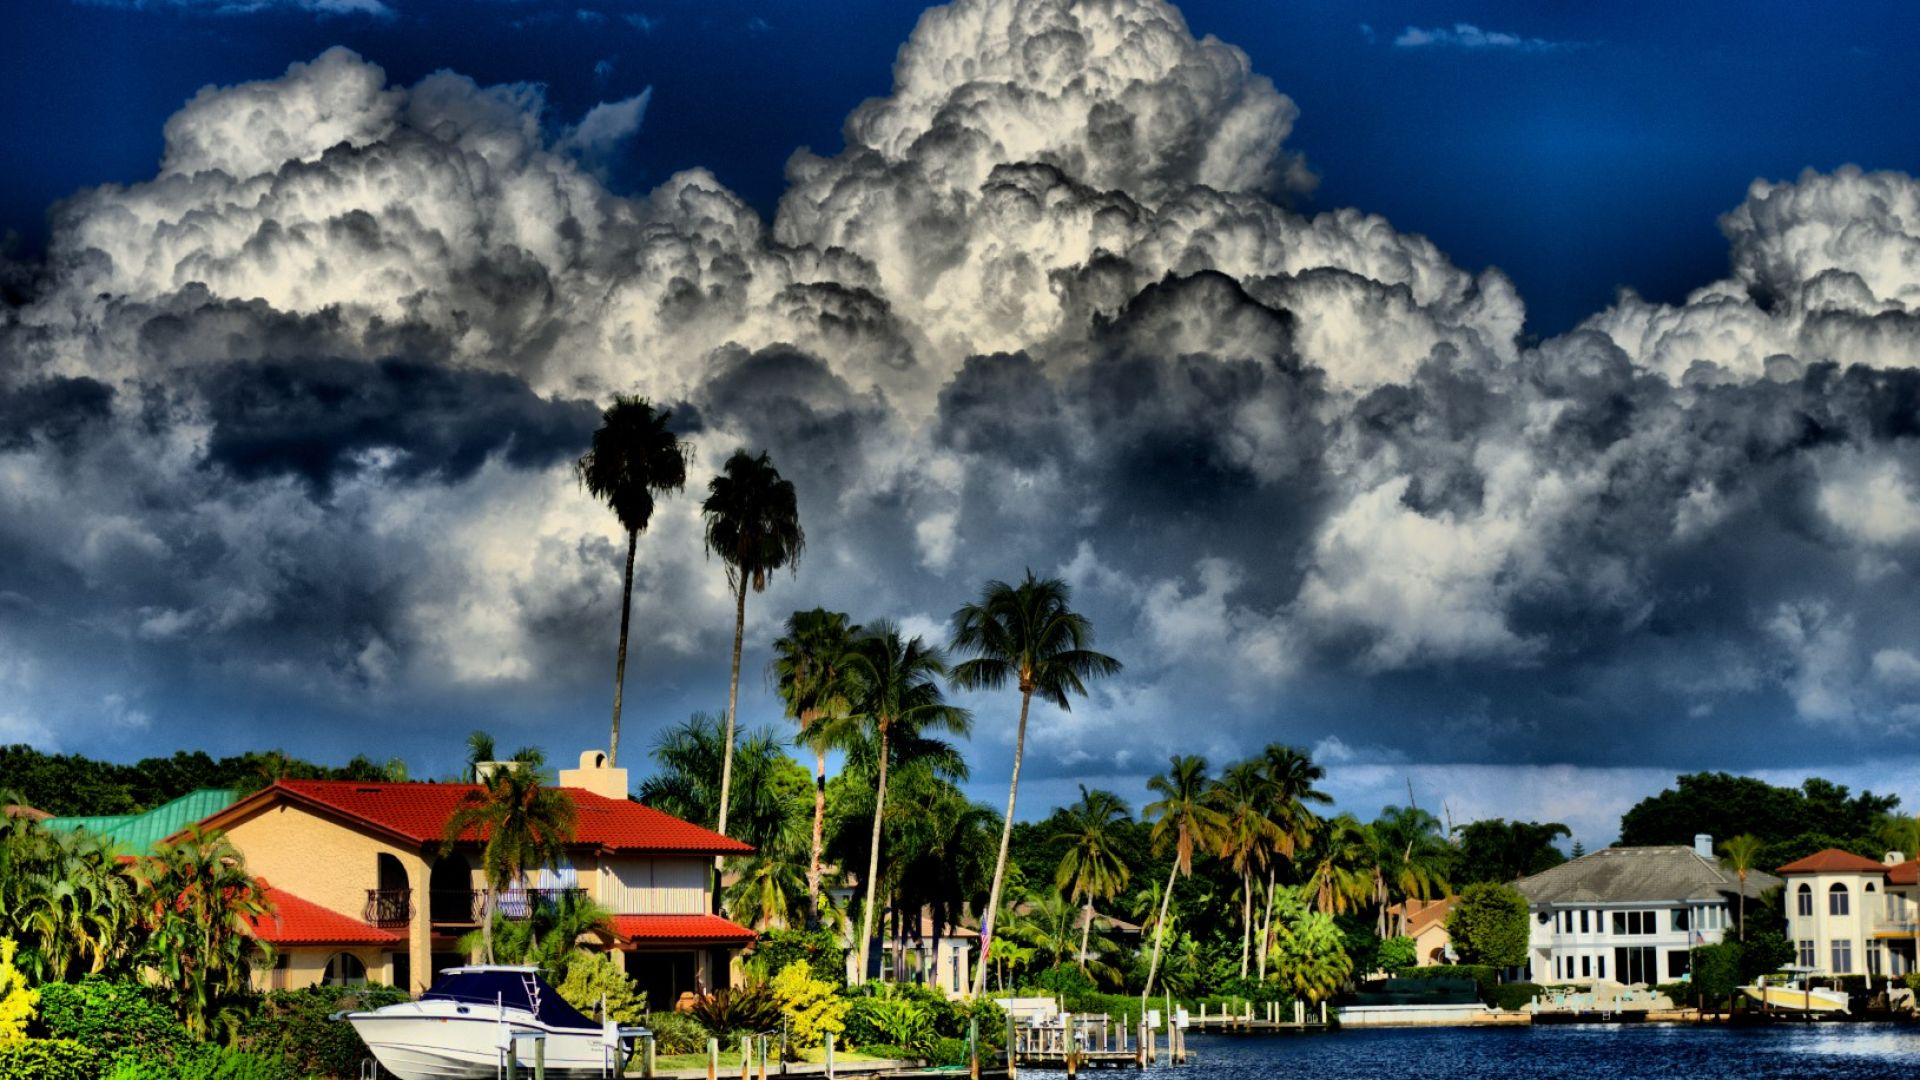 Ураганът Майкъл удря Флорида утре